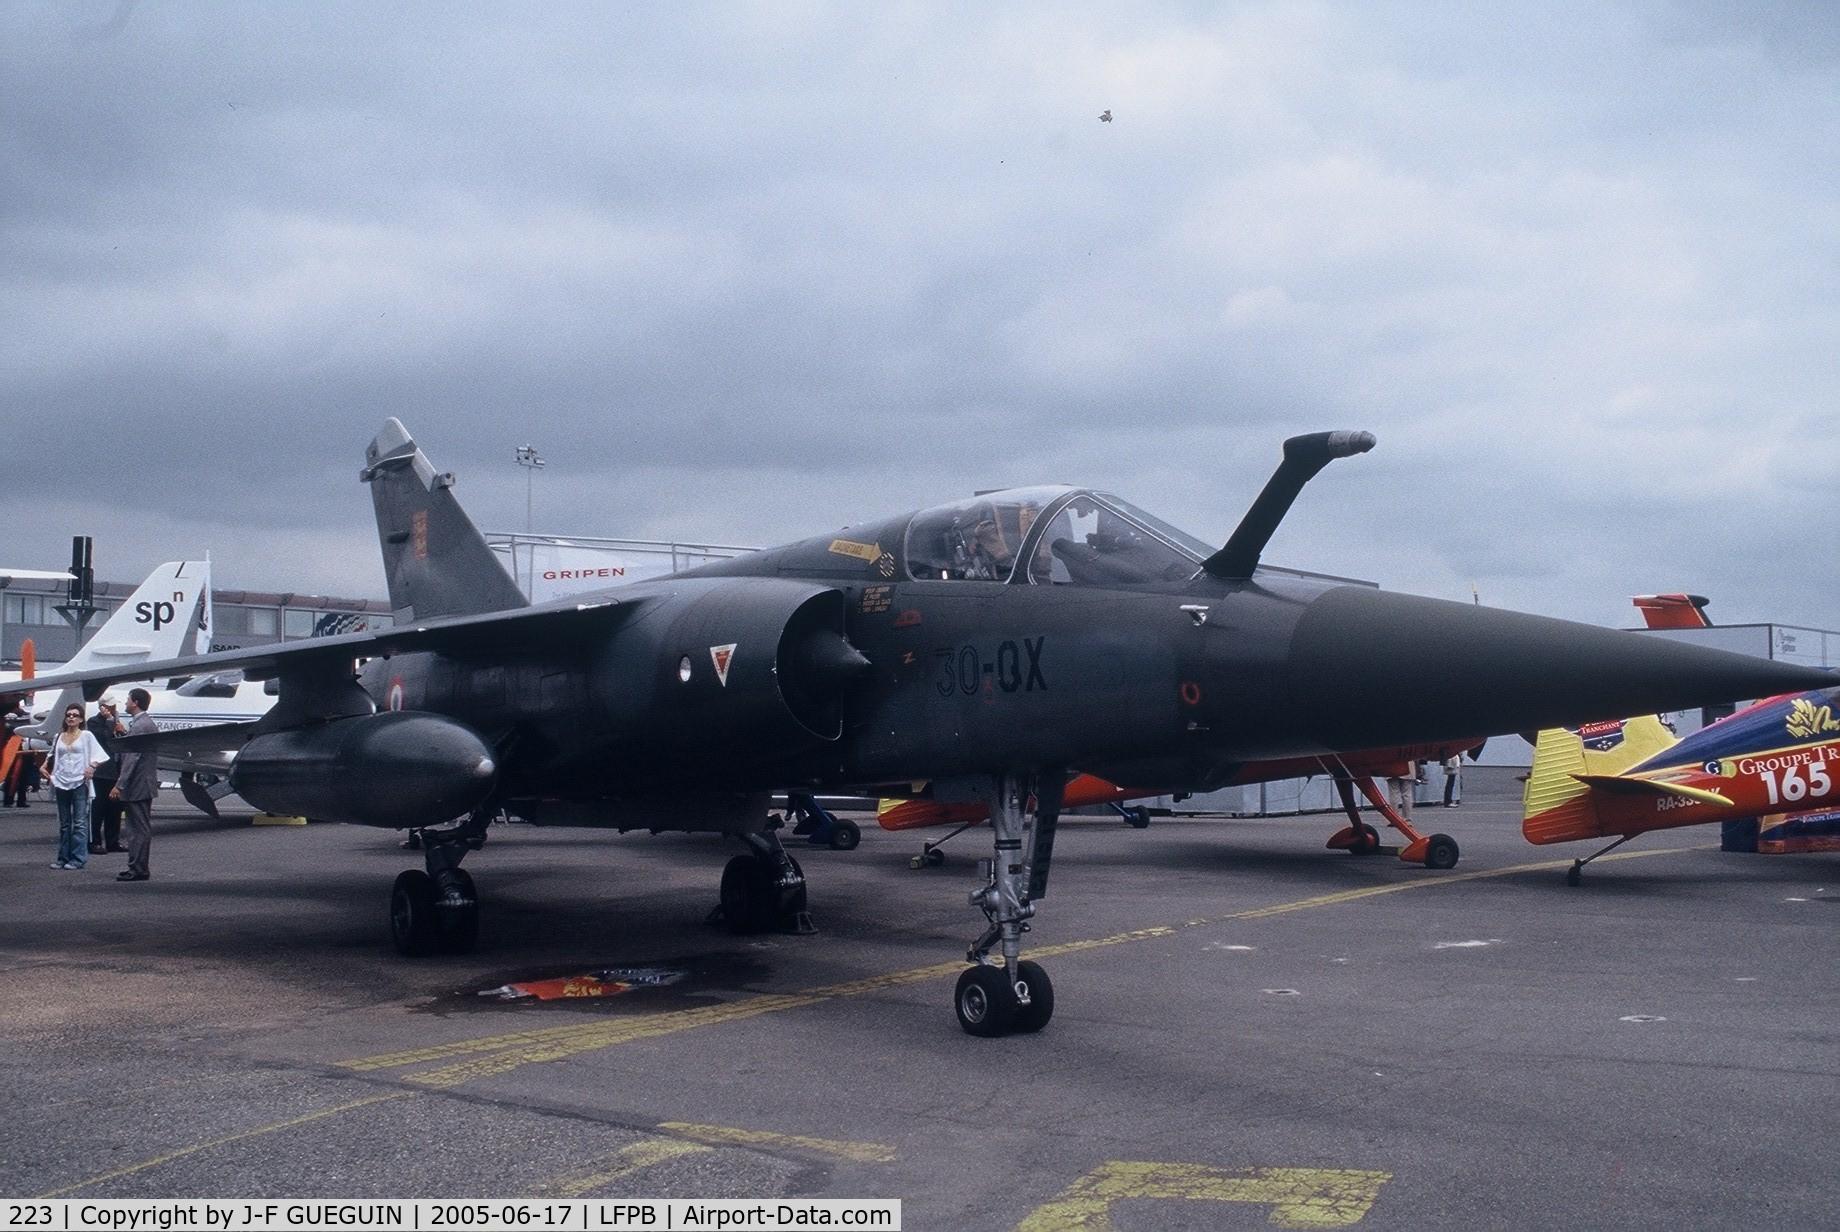 223, Dassault Mirage F.1CT C/N 223, On display at Paris-Le Bourget 2005 airshow.